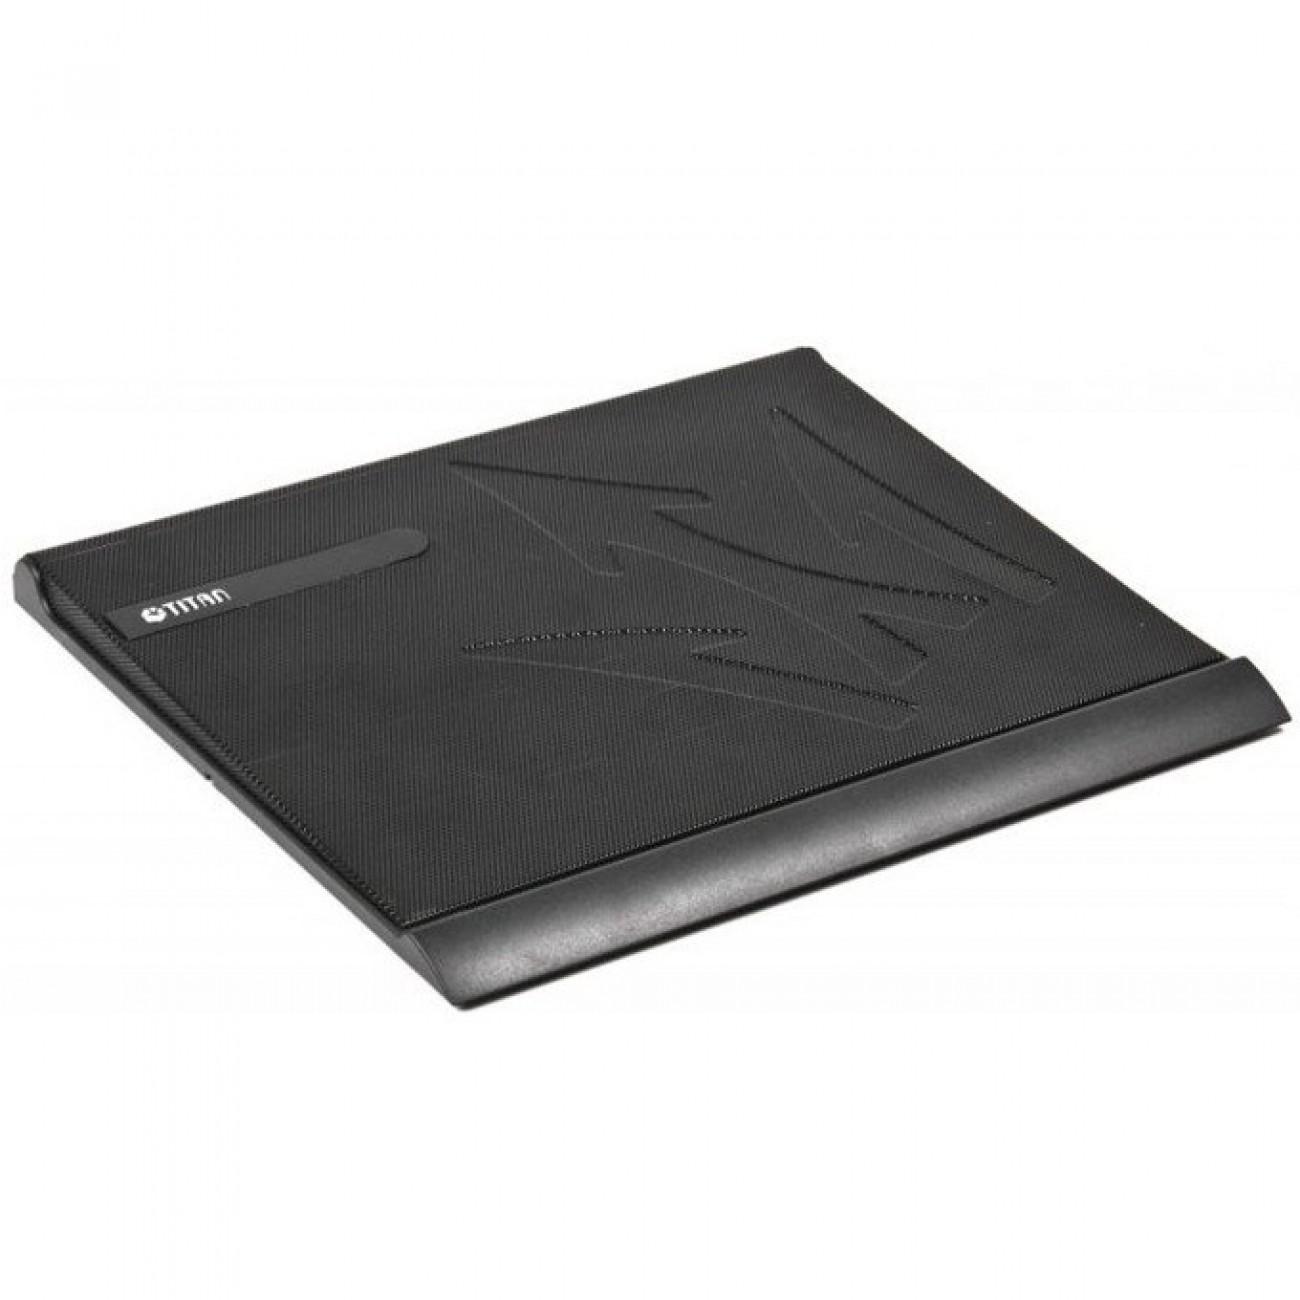 Охлаждаща поставка за лаптоп Titan TTC-G22T, за лаптопи до 15 (38.1 cm), черна в Лаптоп Охладители -  | Alleop